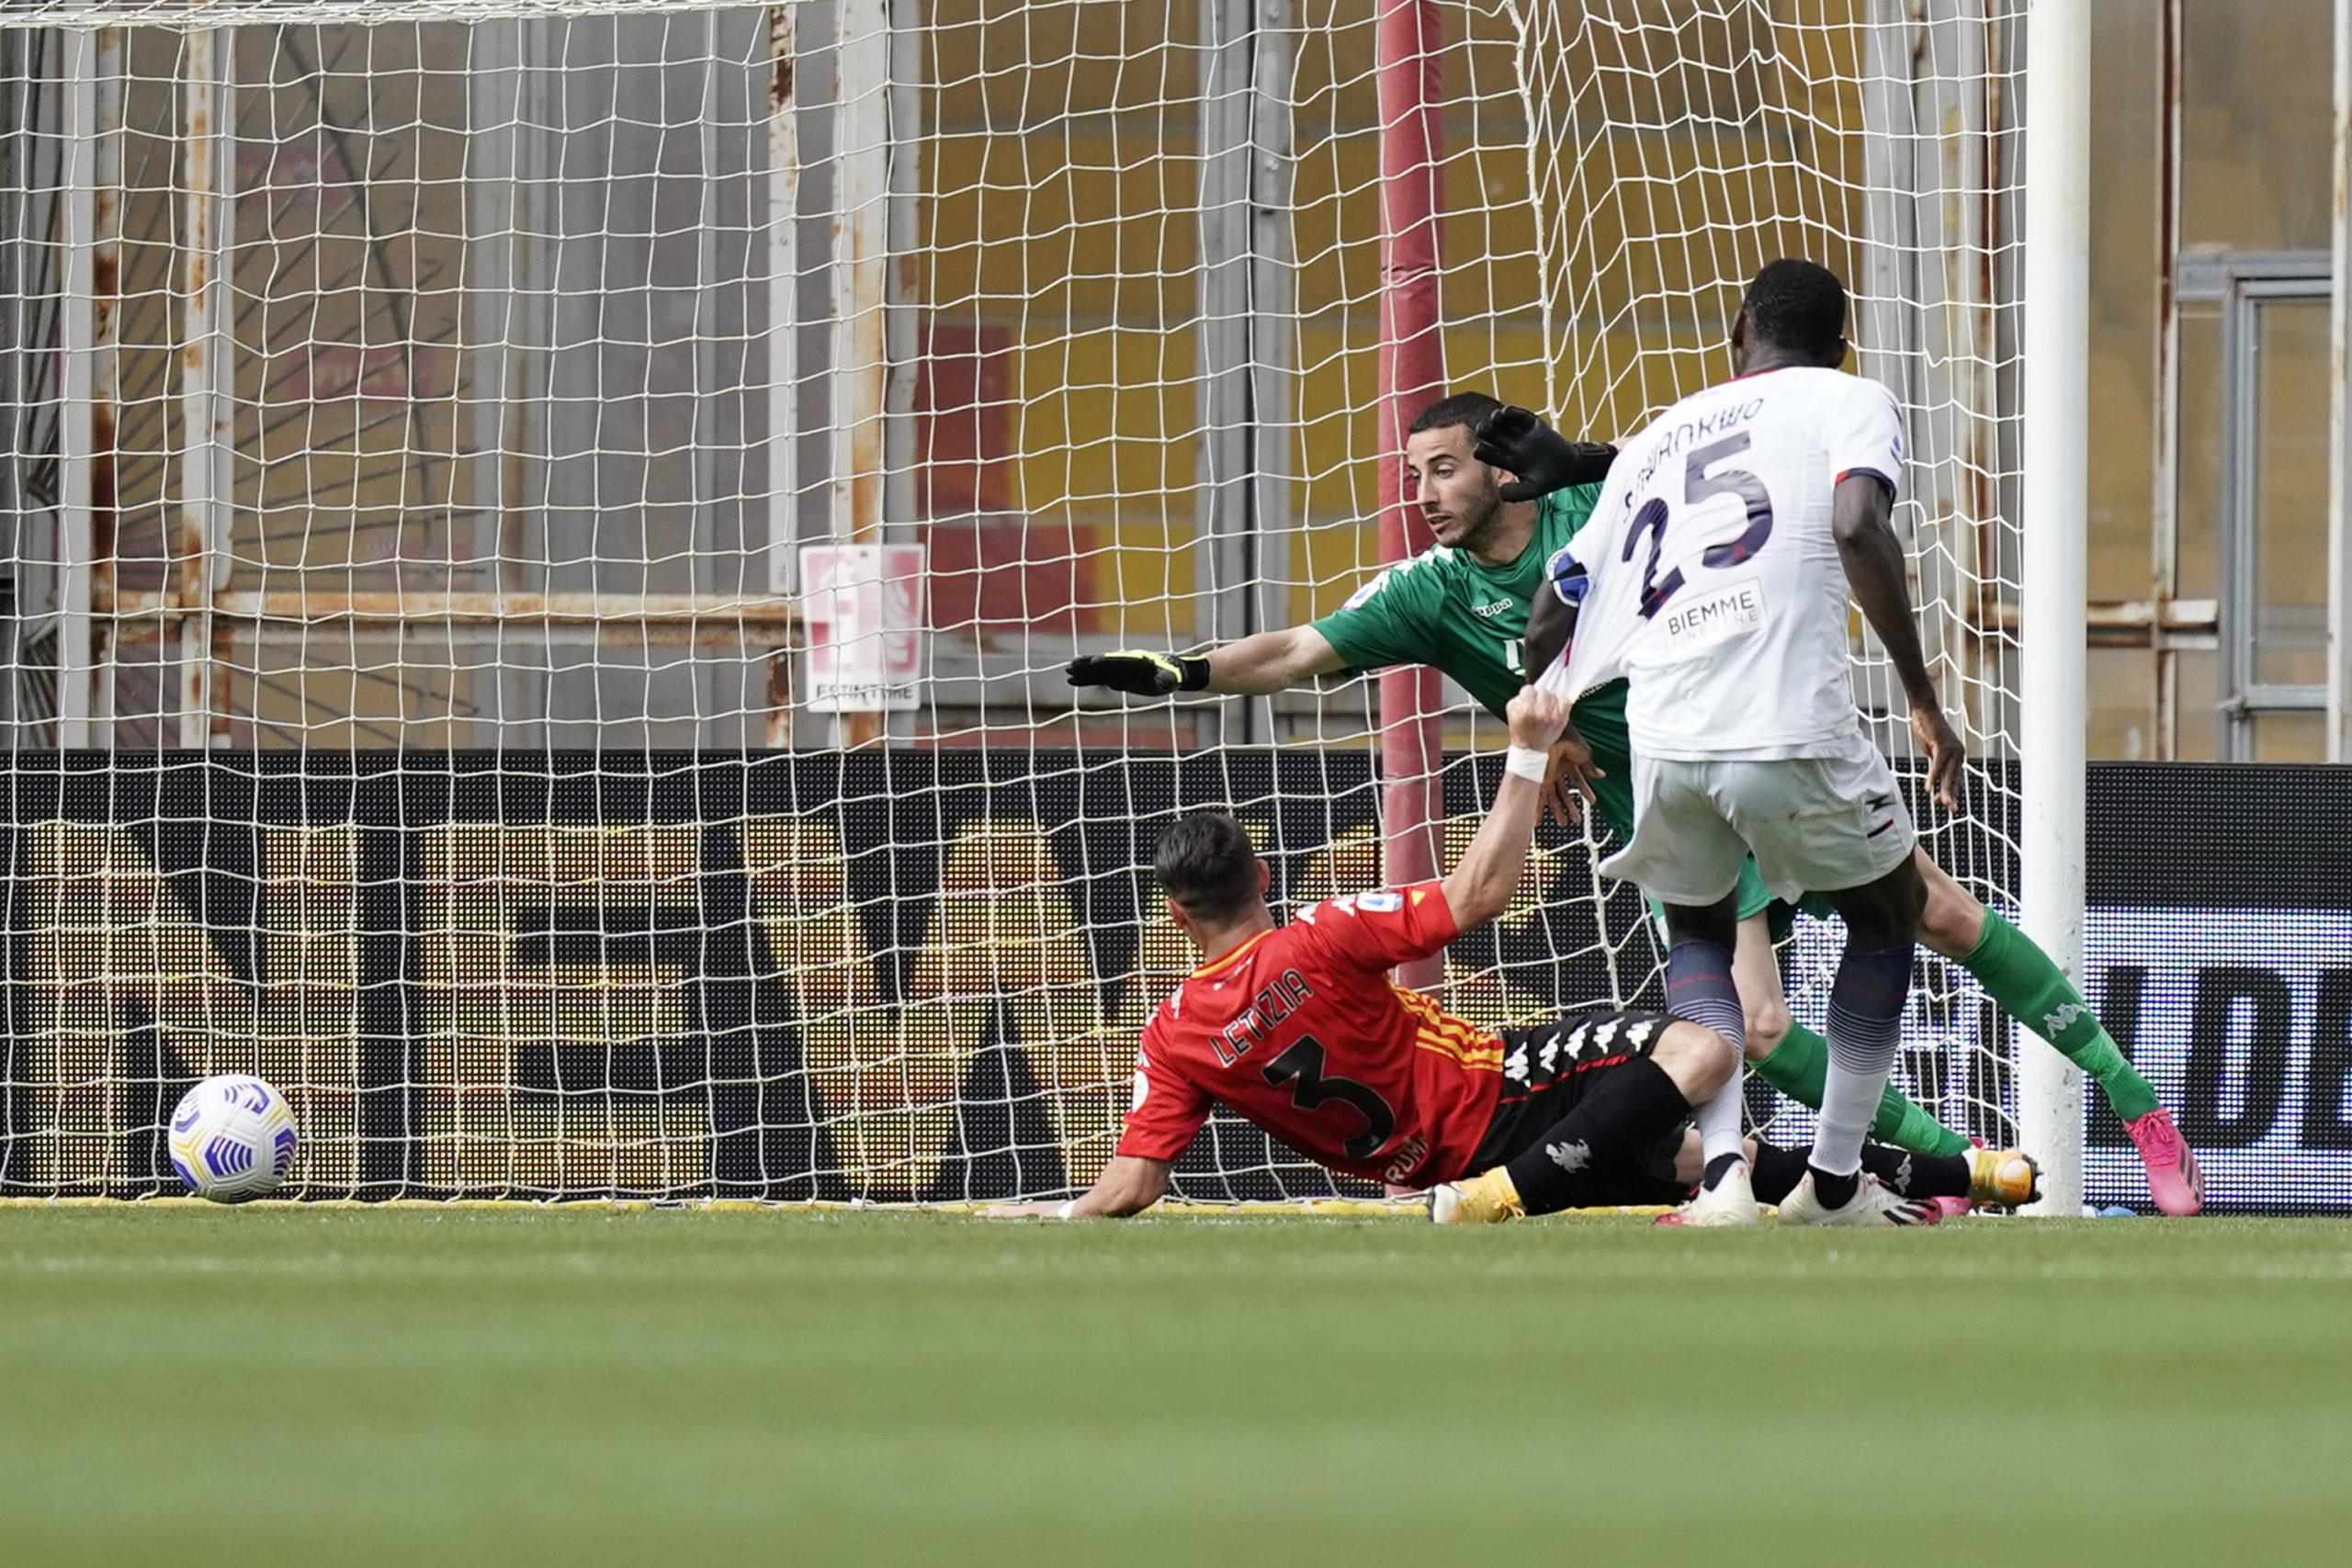 Crotone striker Simy scores against Benevento